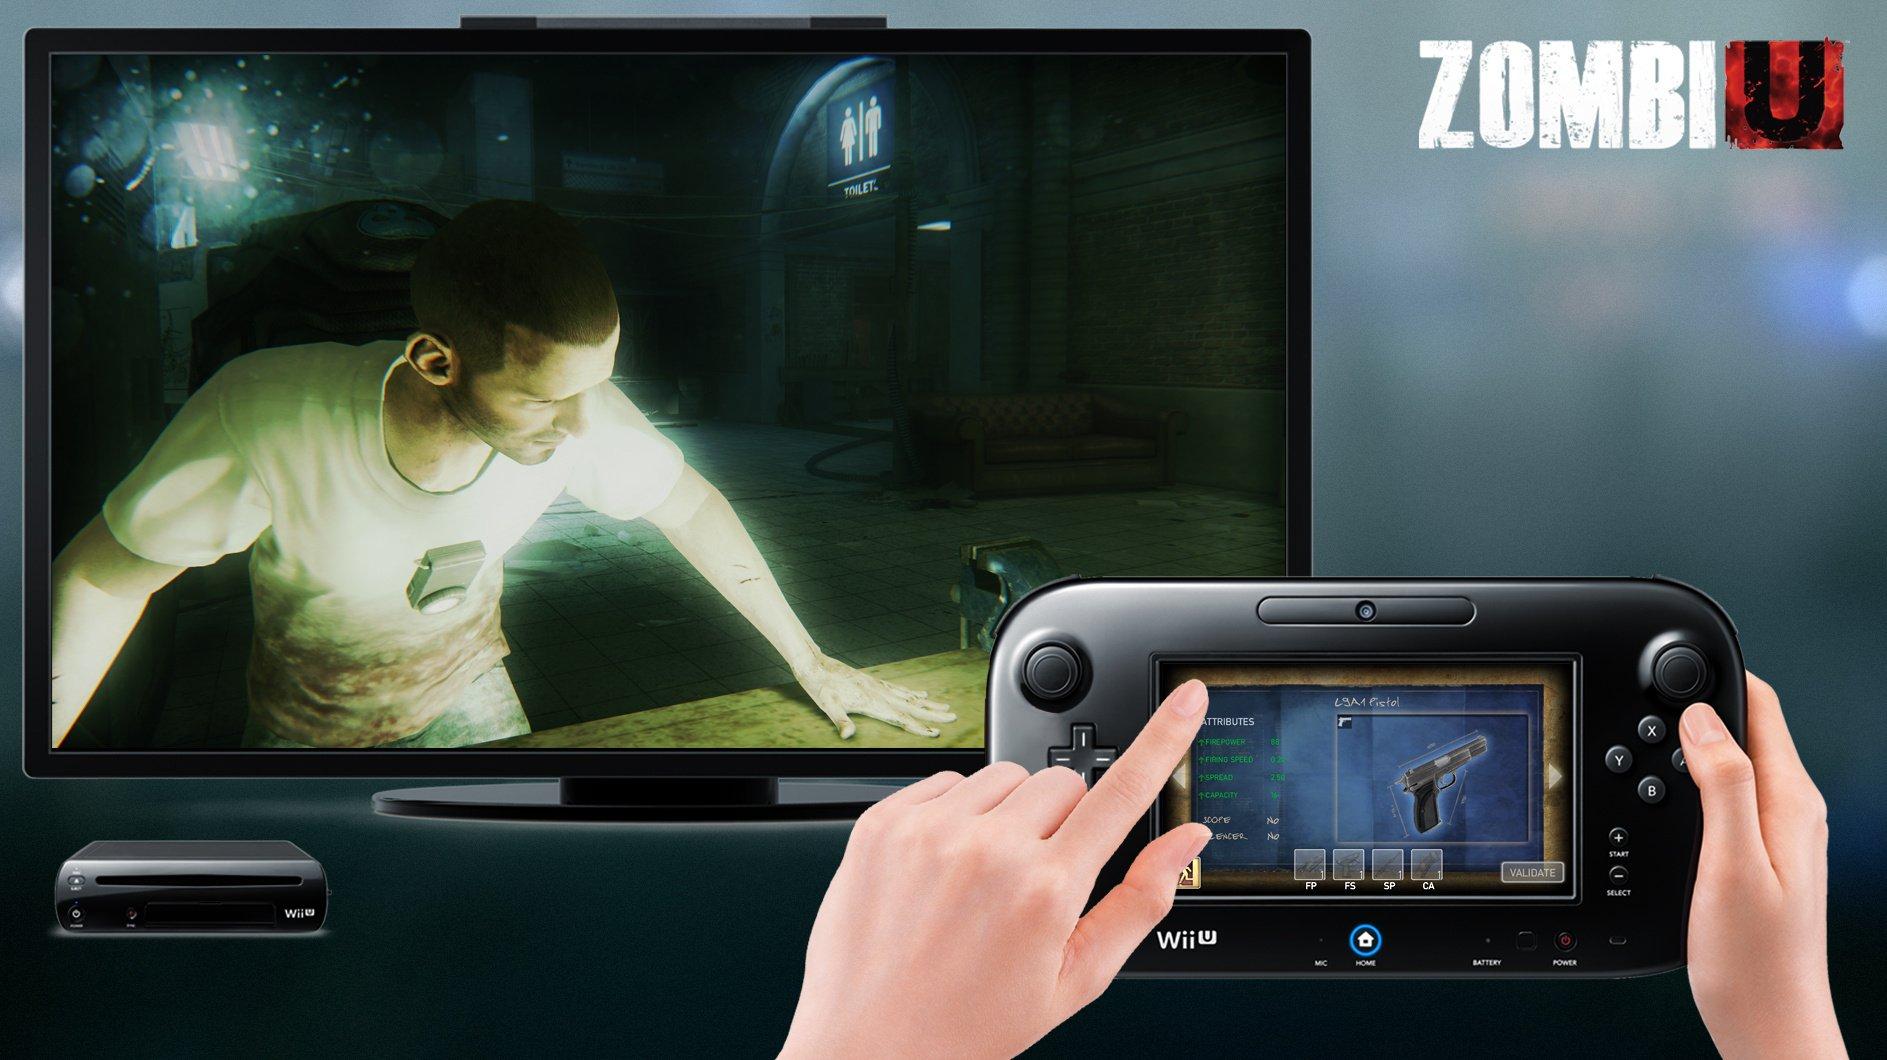 Wii U Game Trailer : Zombiu wii u news reviews trailer screenshots